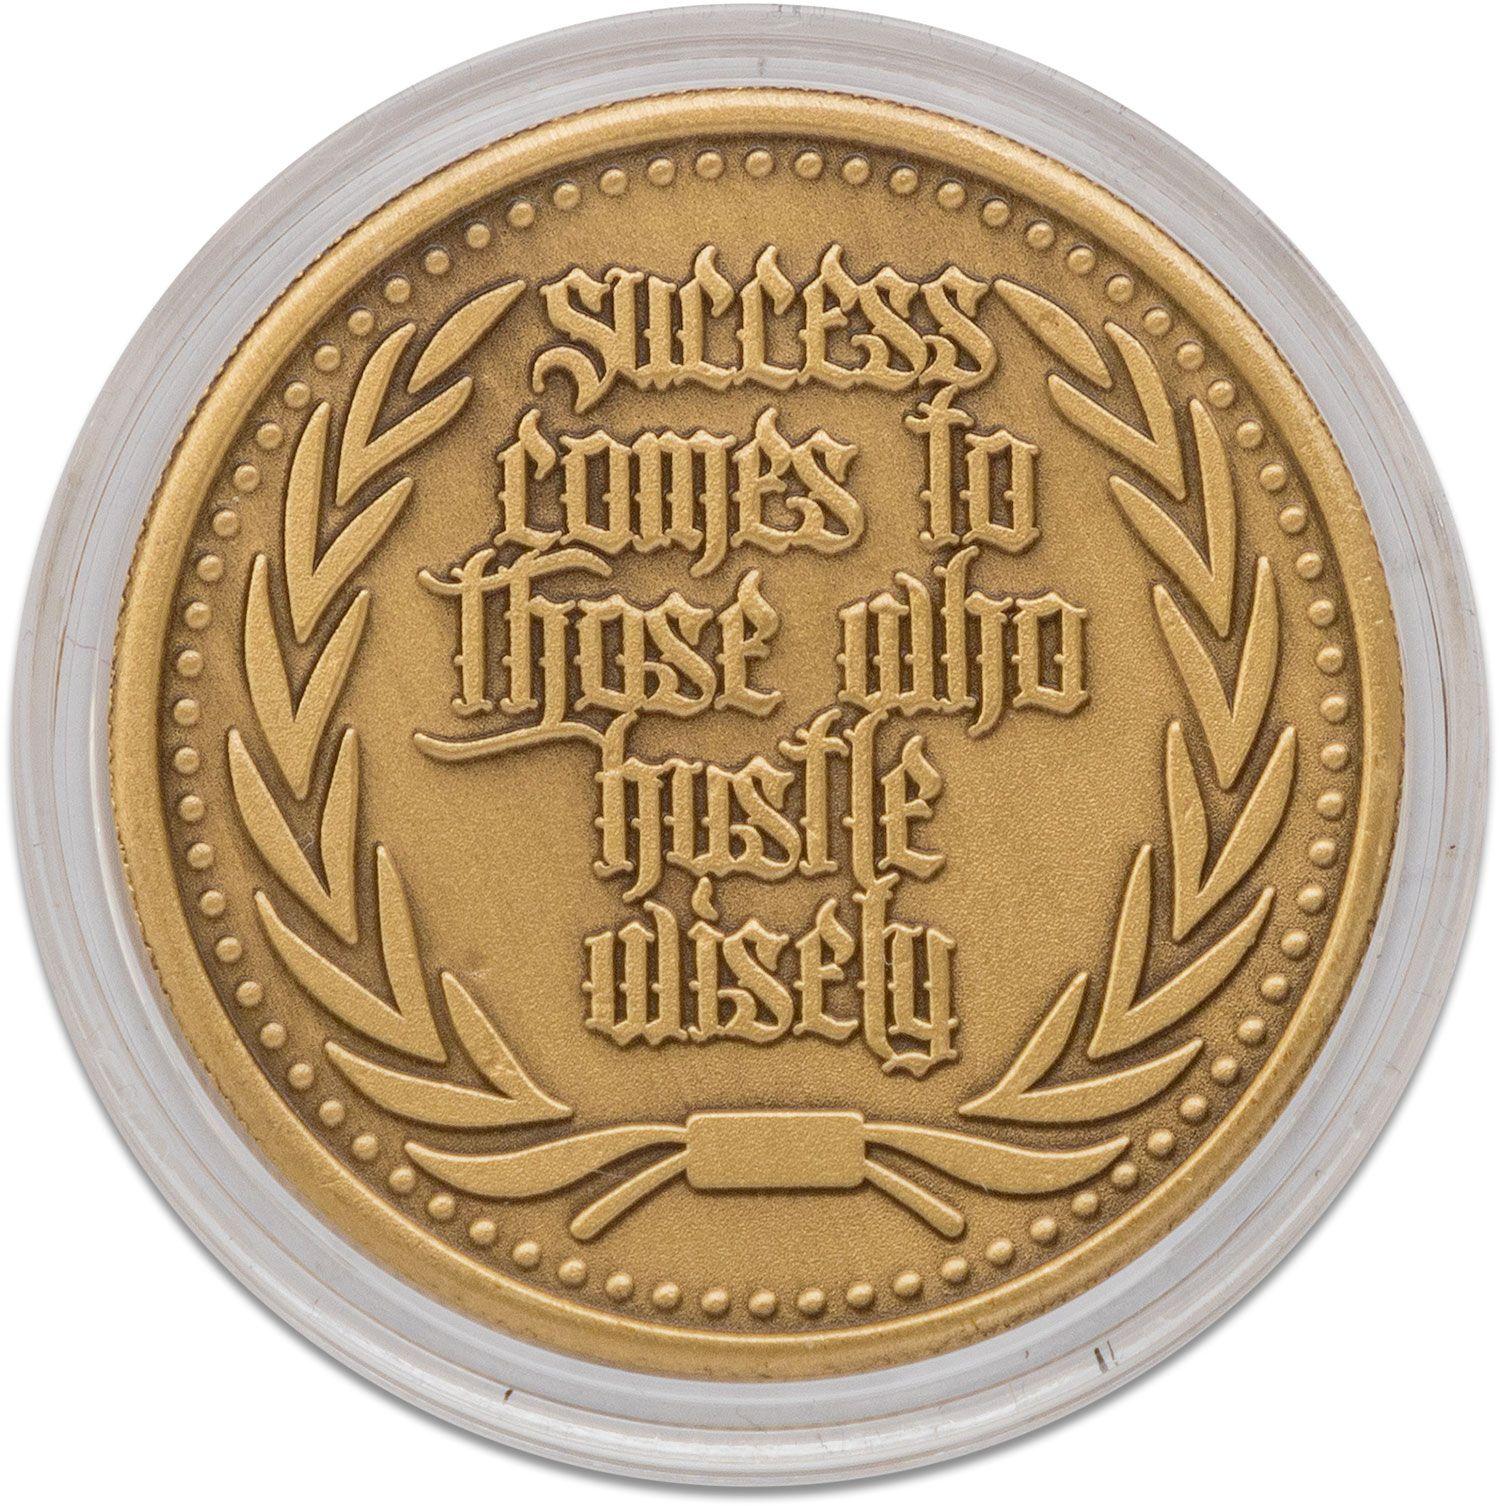 Marfione Custom Knives Custom Antique Bronze Hustle Challenge Coin